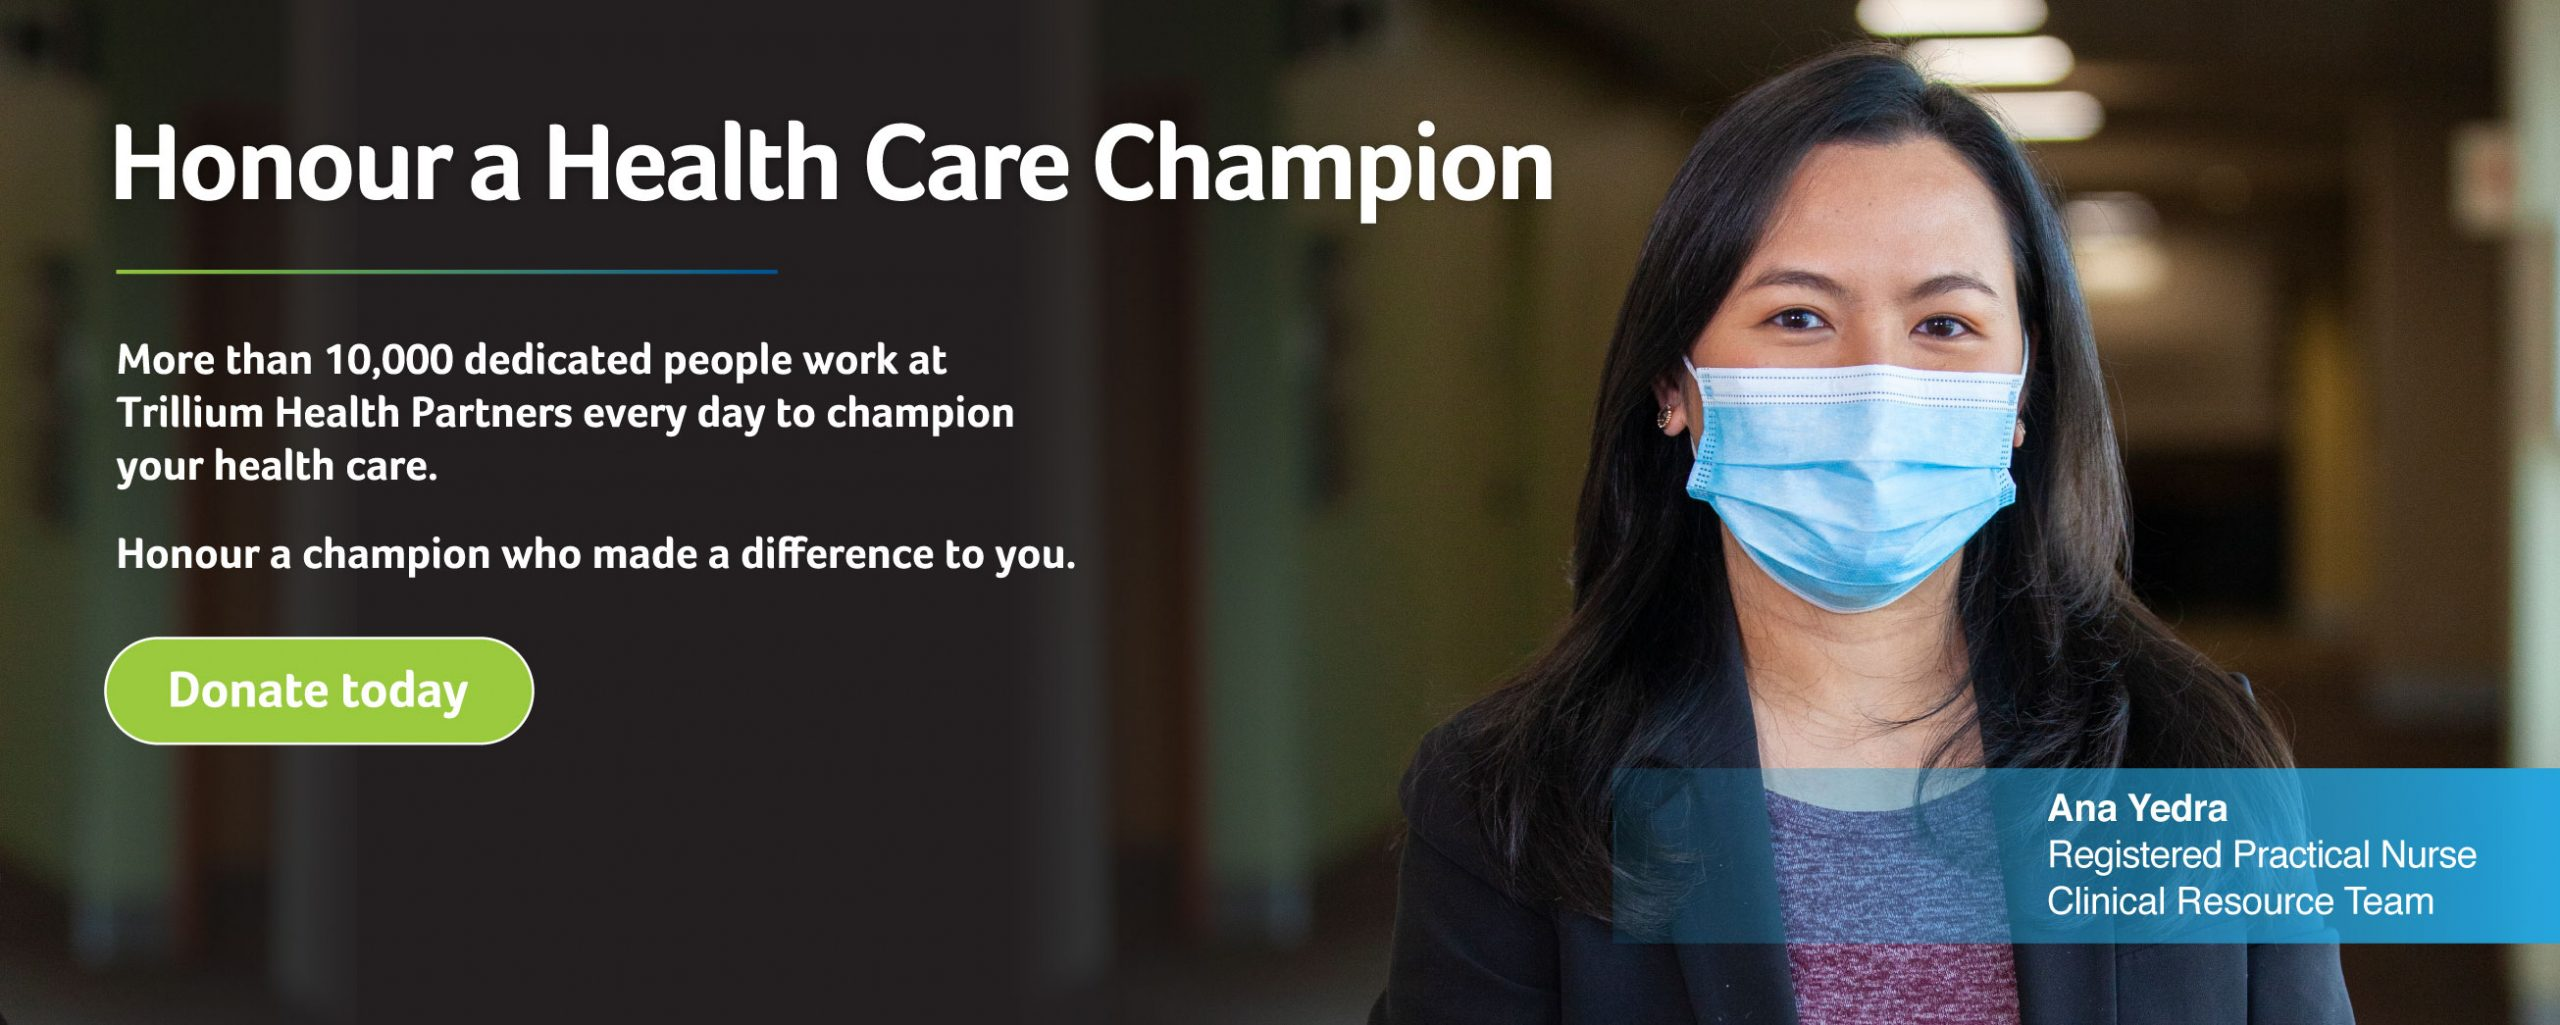 Hounor a Health Care Champion